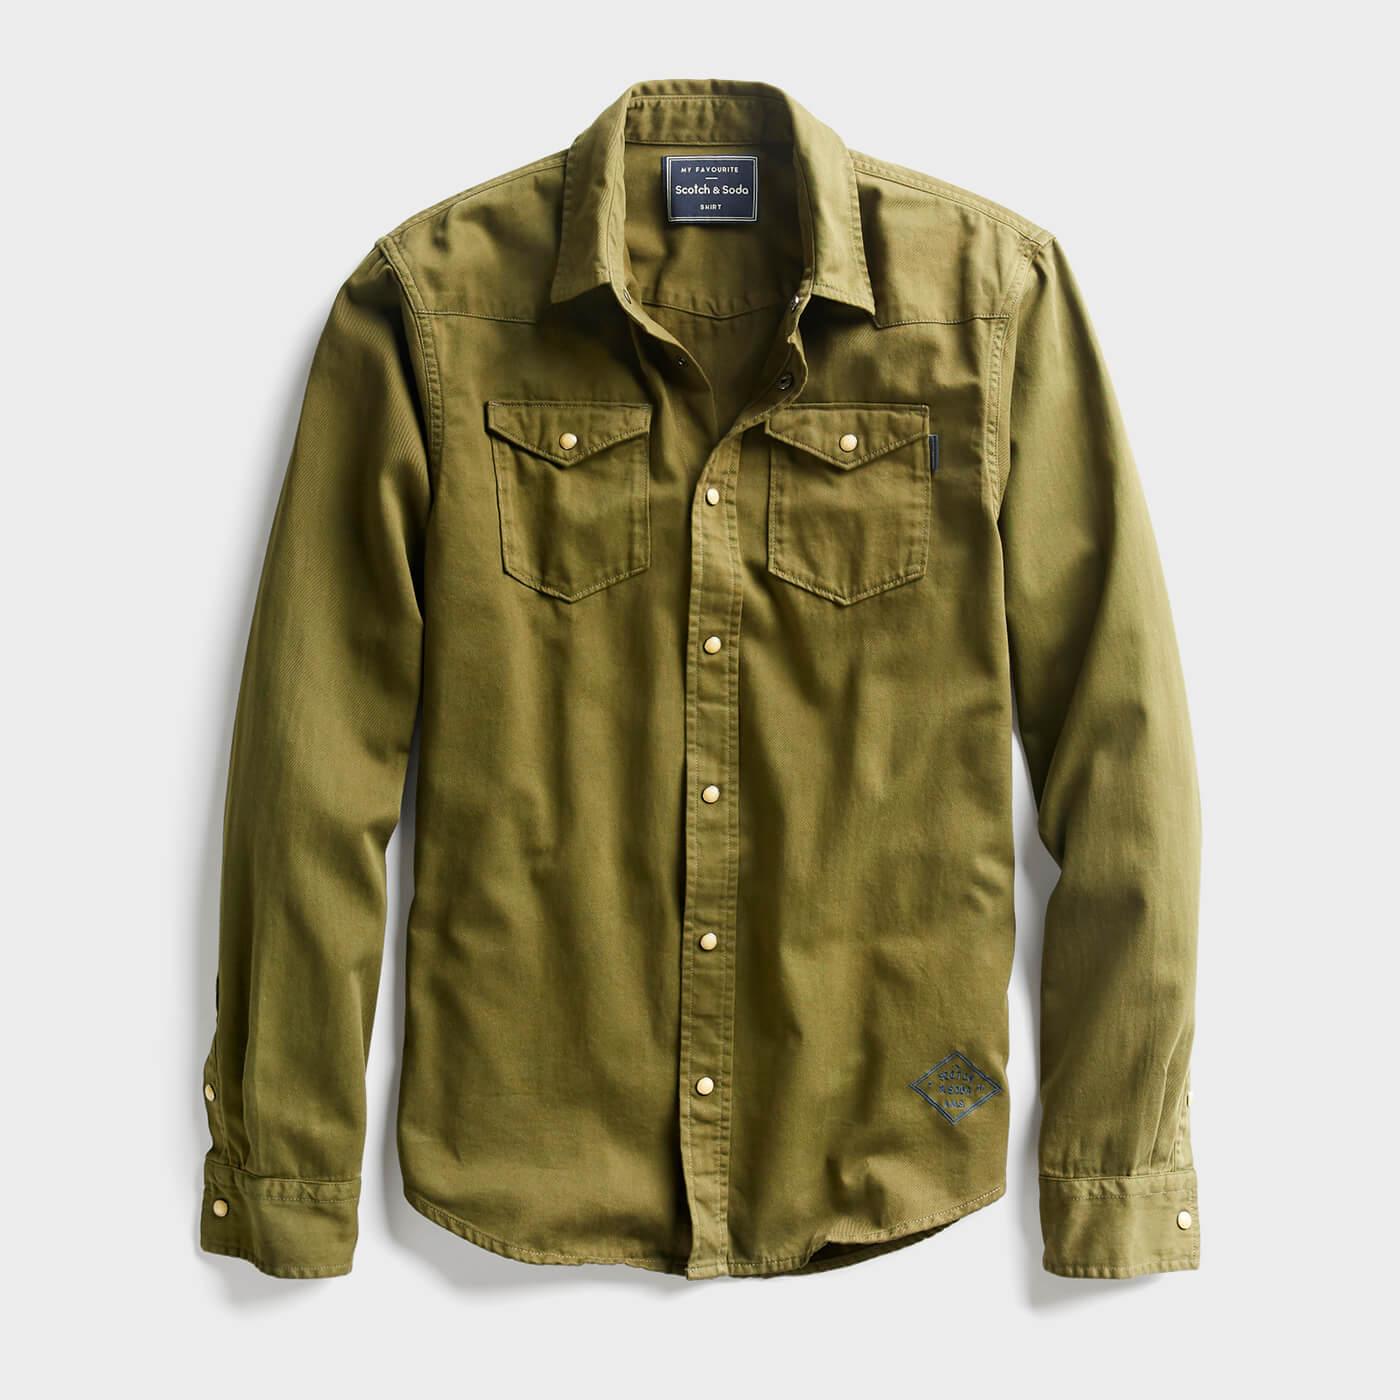 olive green work shirt